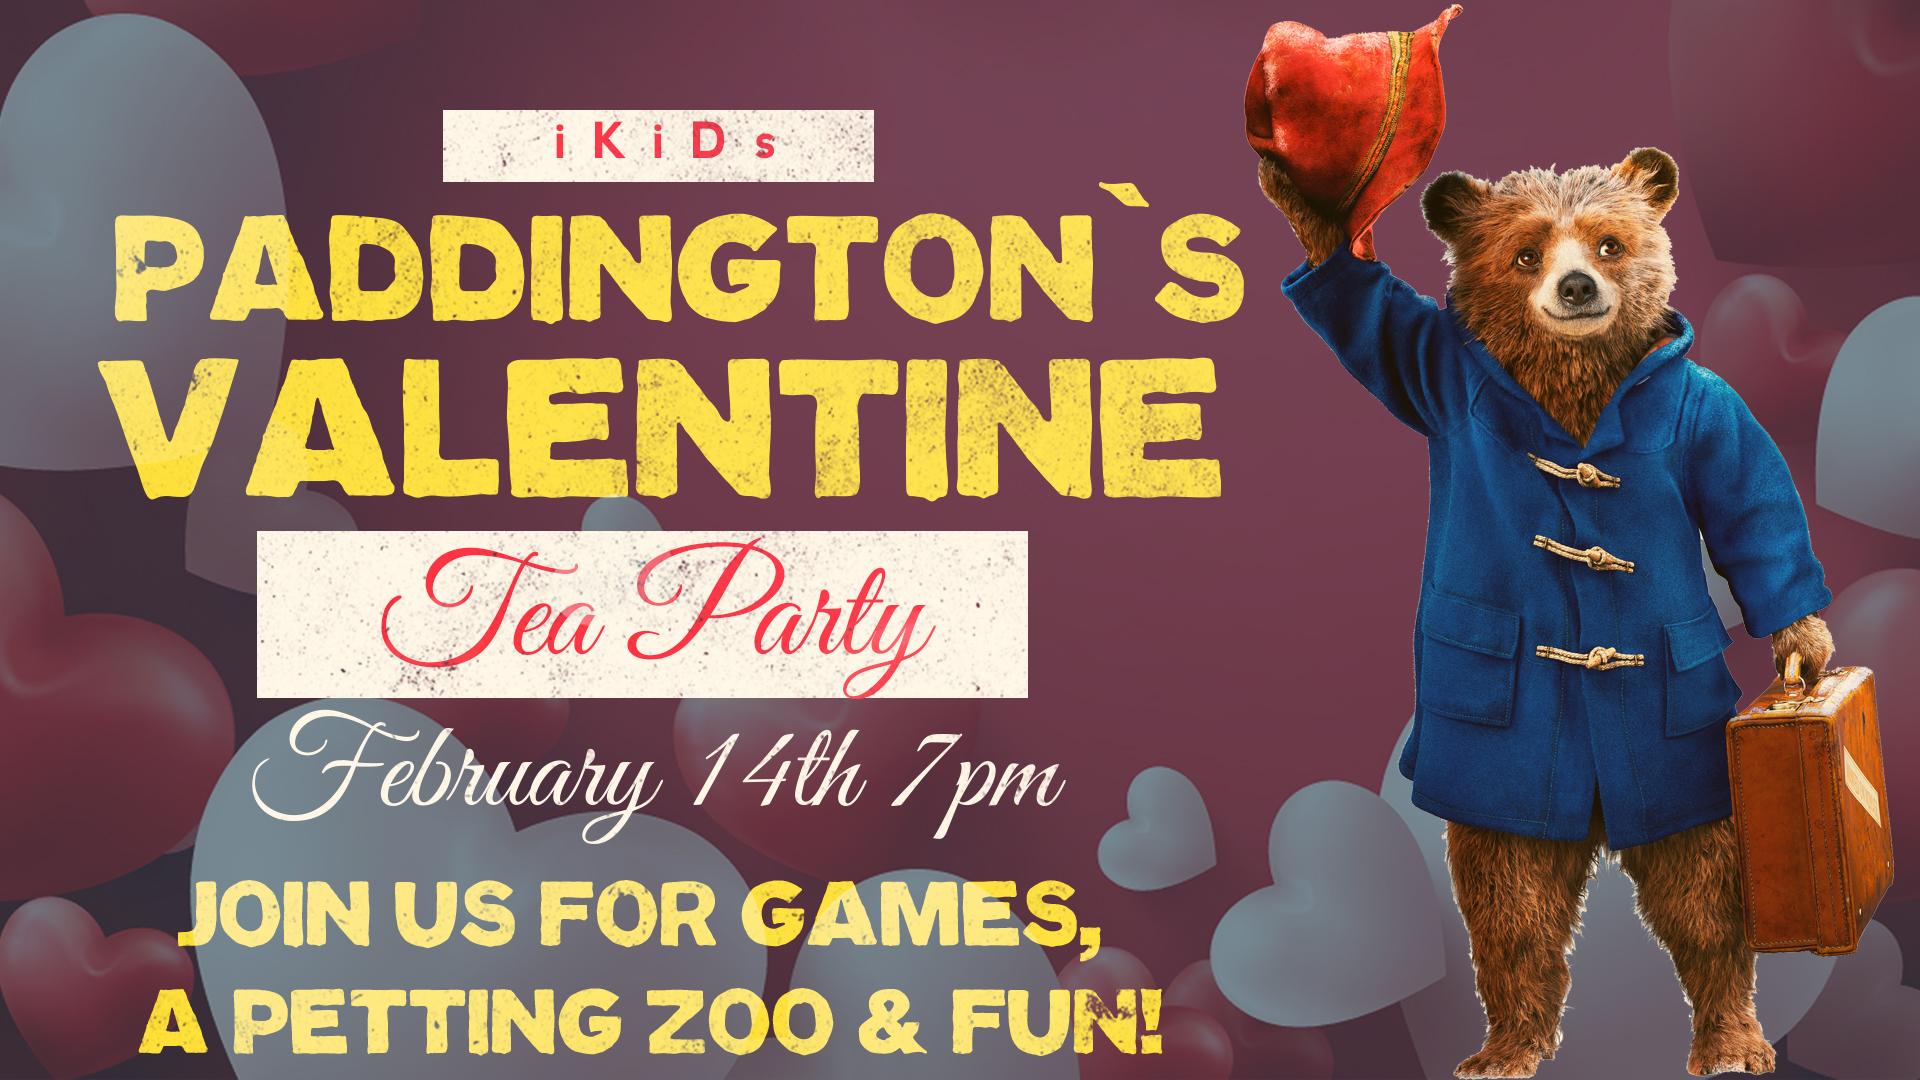 iKiDs Paddington Bear Valentines Party.jpg